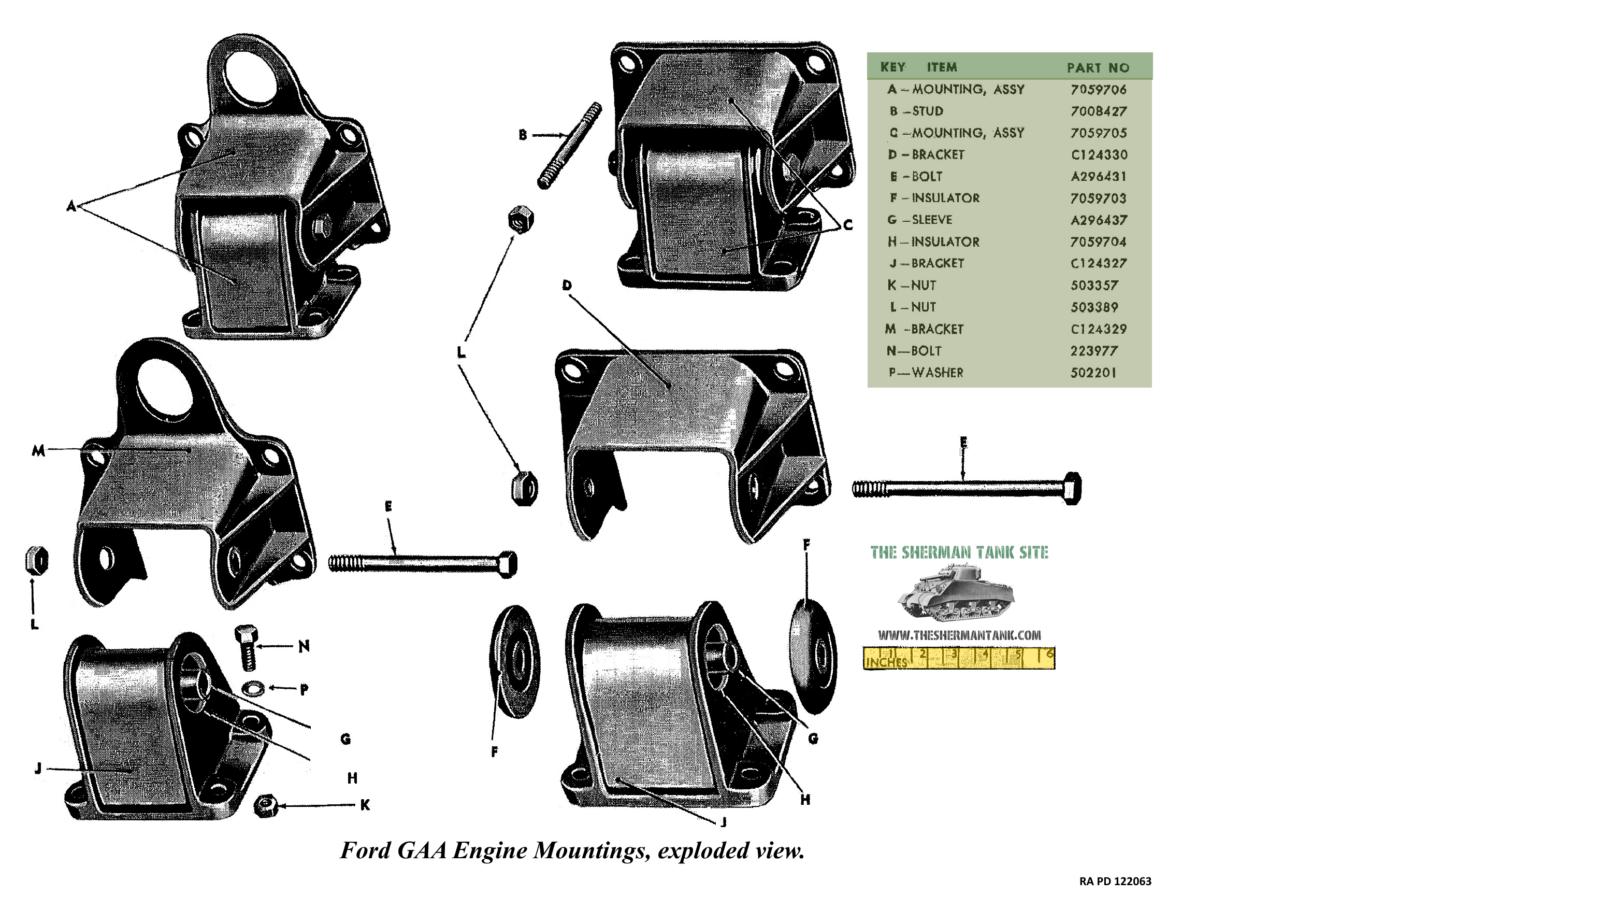 GAA-motor-mounts-improved-FLATT-1600x909